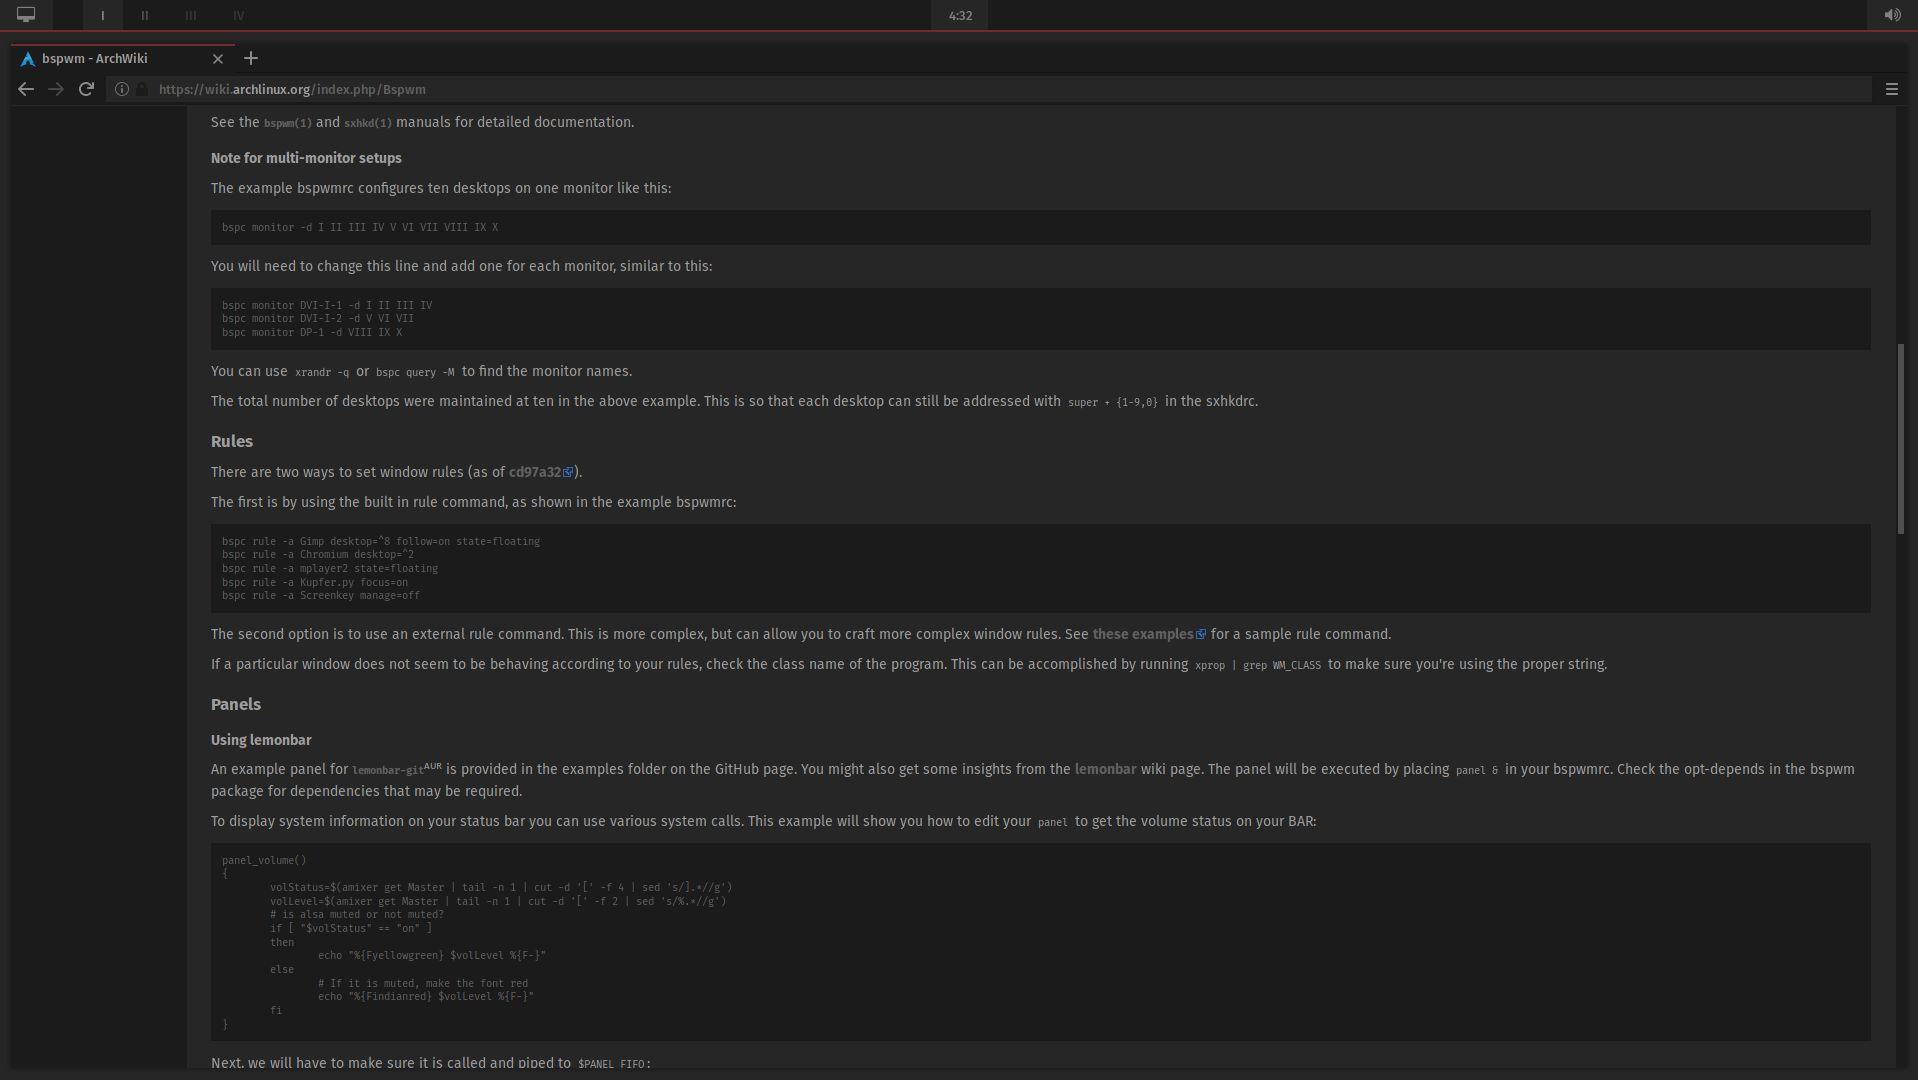 GitHub - Vixtron/bspwm: My bspwm, Arch Linux dotfiles